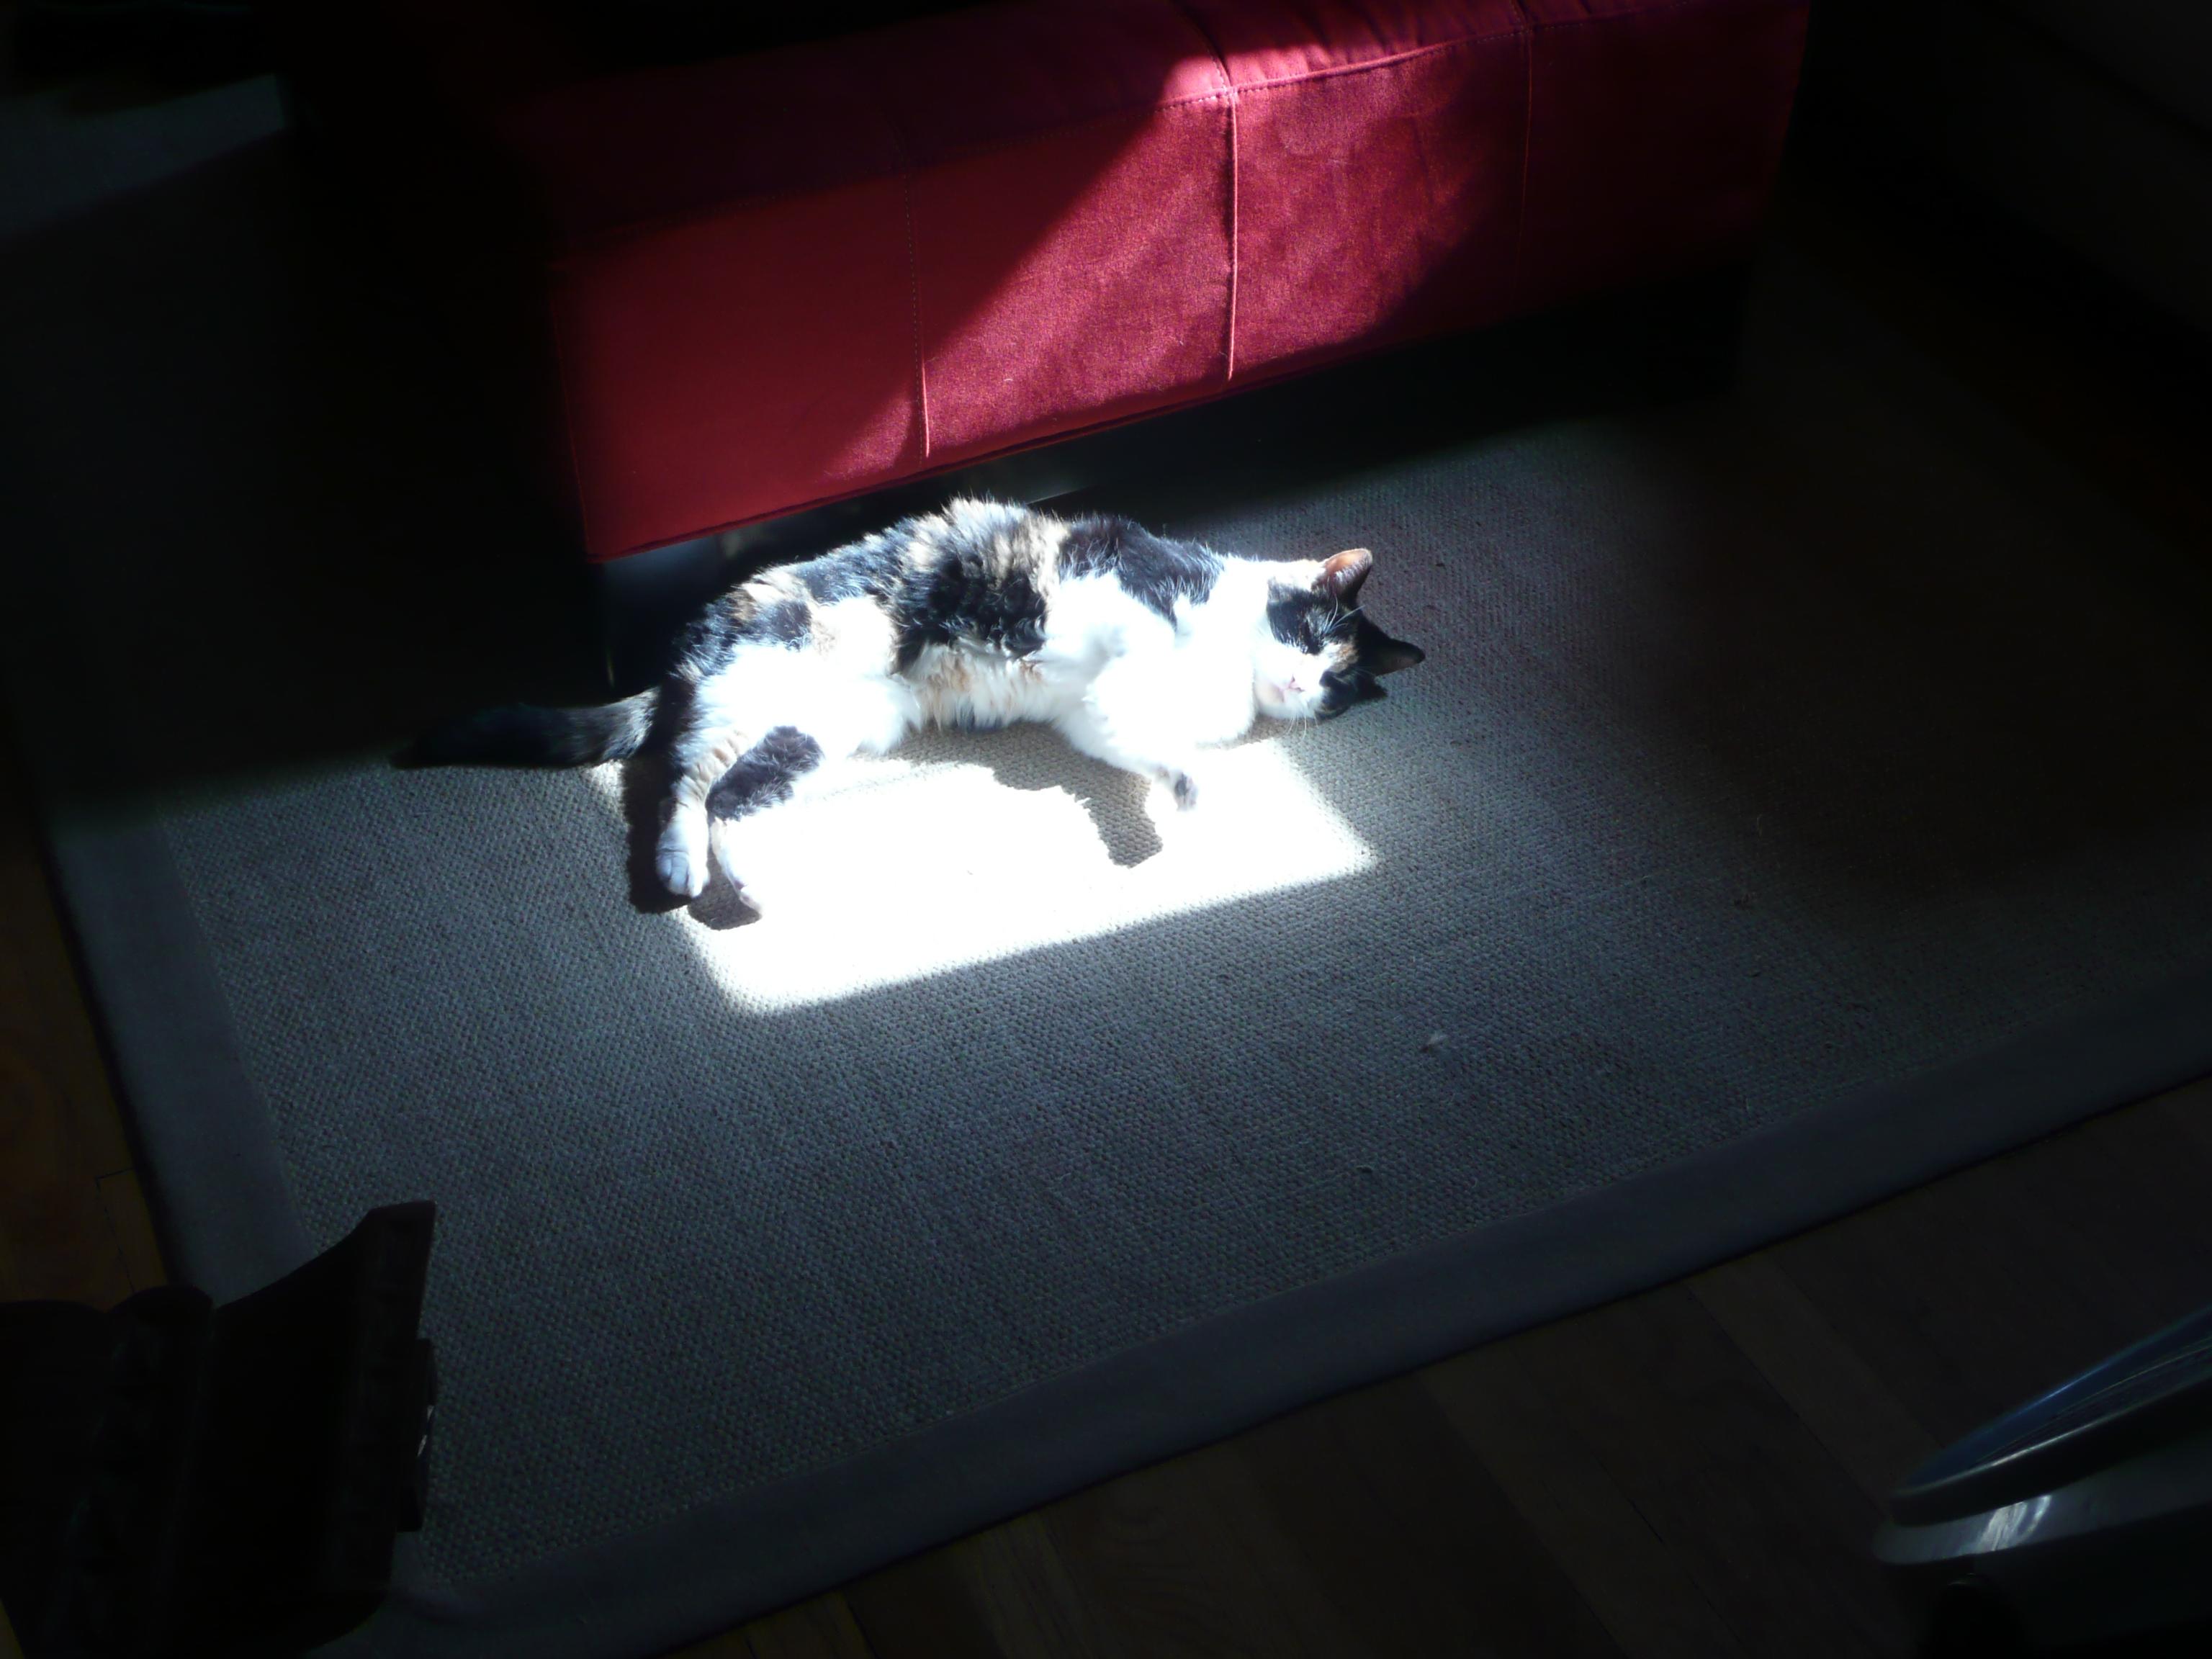 Light Pet Sun Luz Cat Hair Fur Carpet Furry Feline Chat Lumiere Gato Calico Rug Sunspot